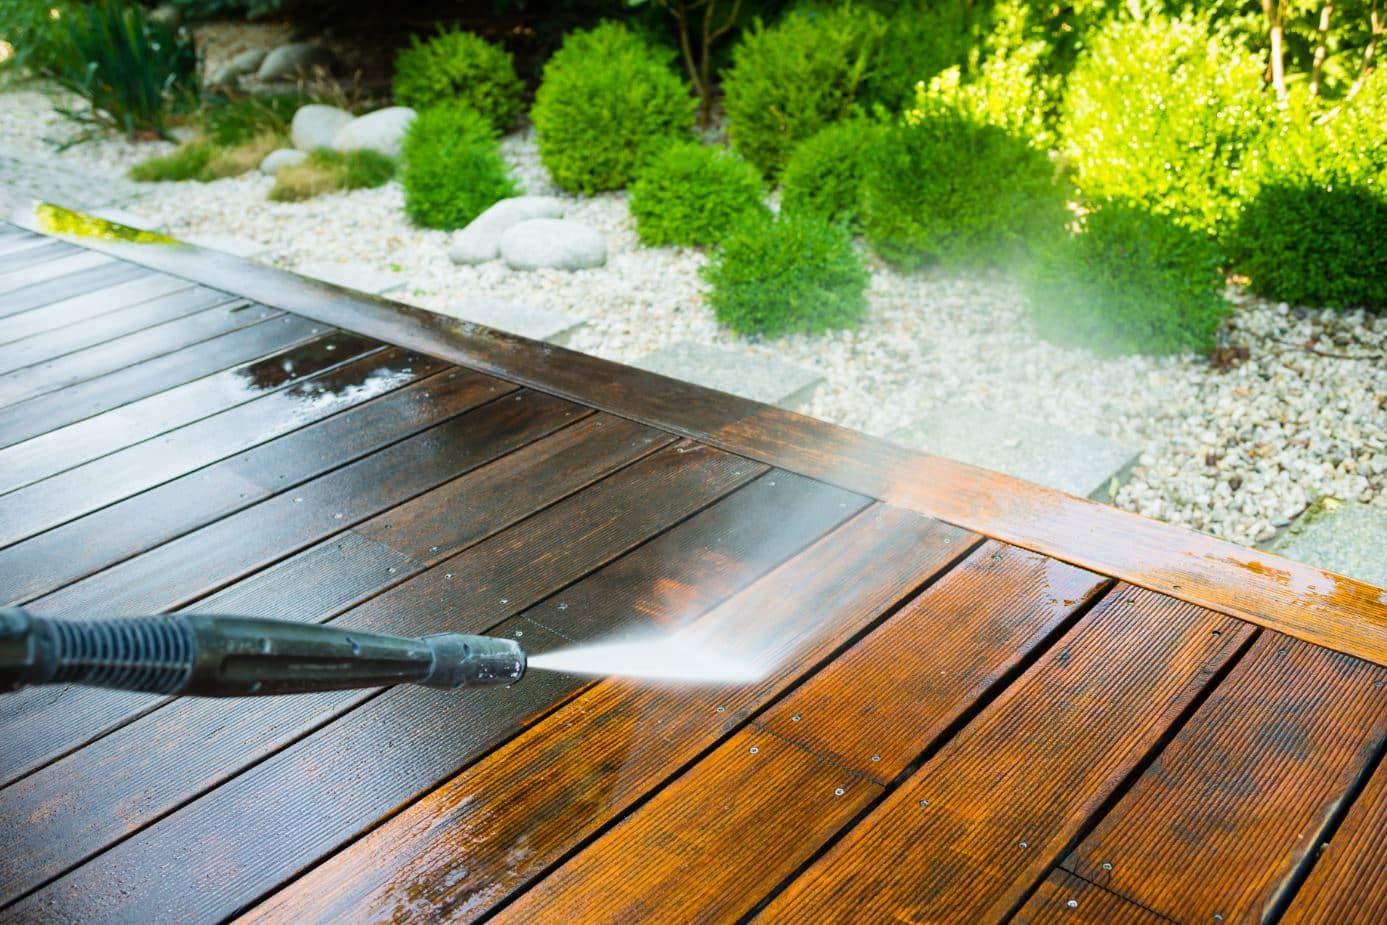 Black gerni pressure washing a patio